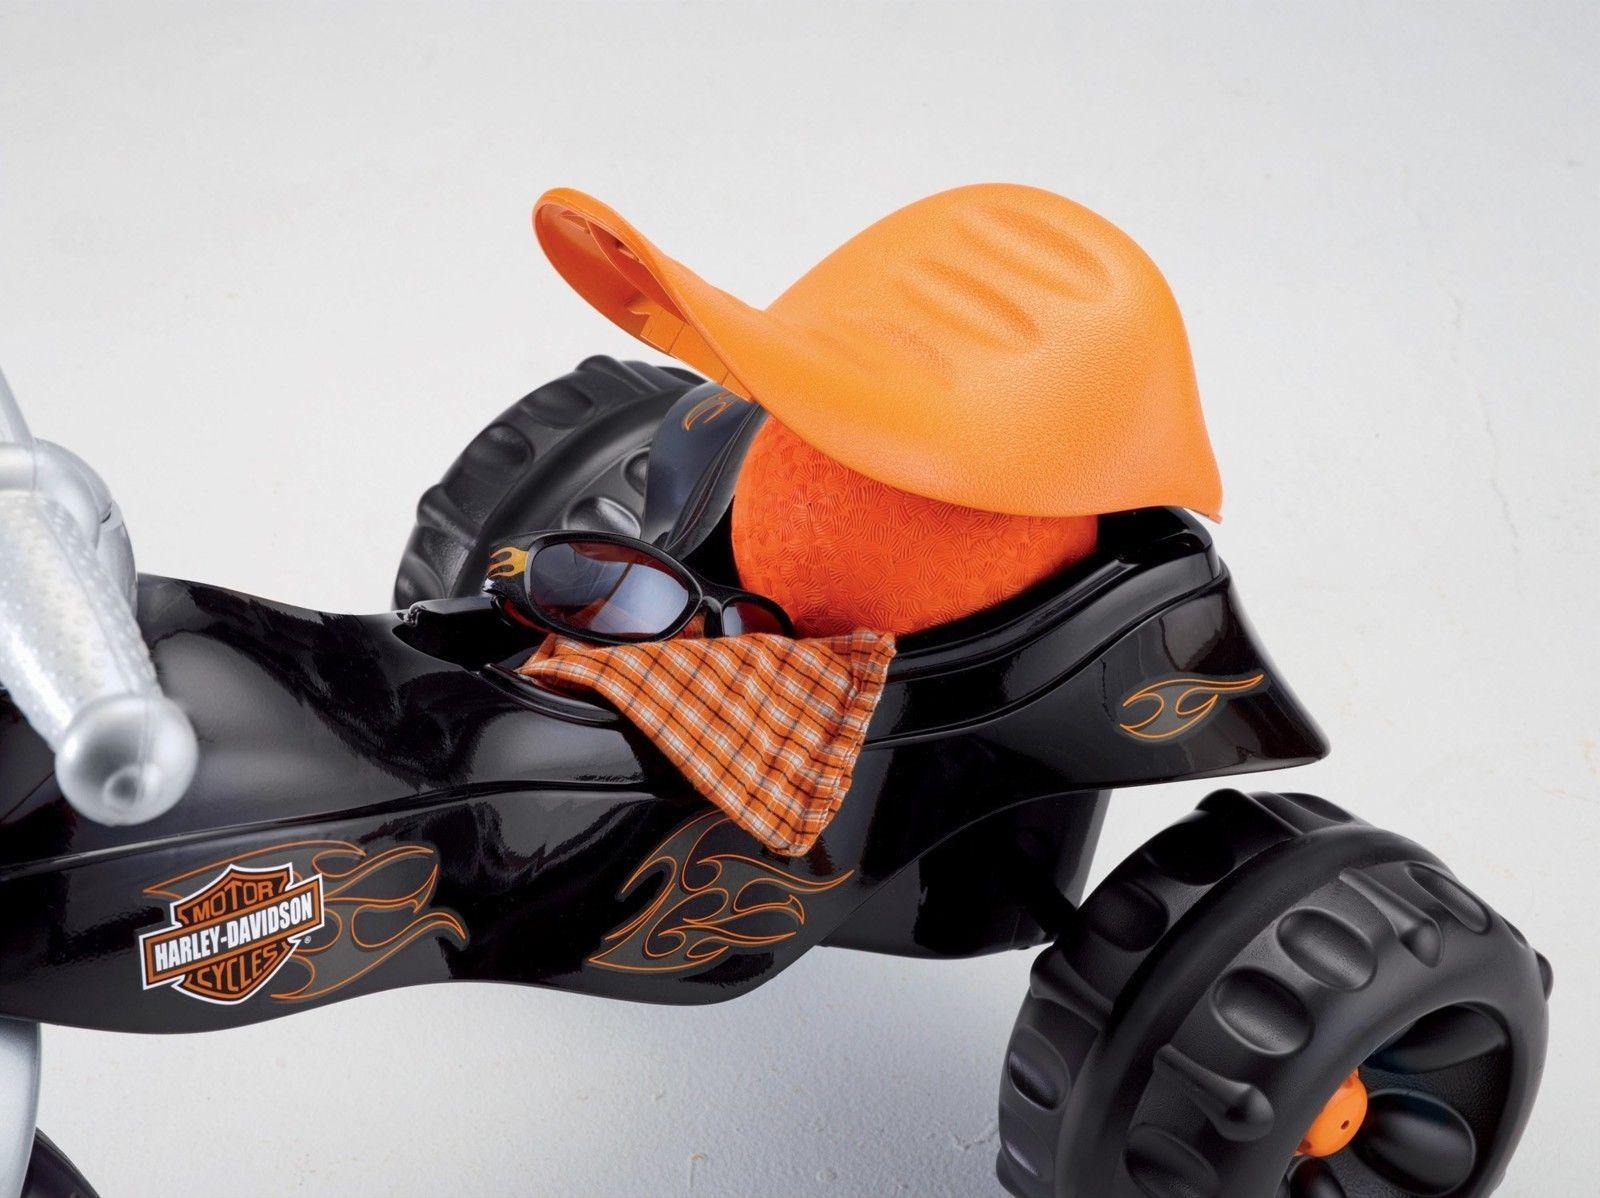 Harley-Davidson Tough Trike Kids Christmas and 50 similar items